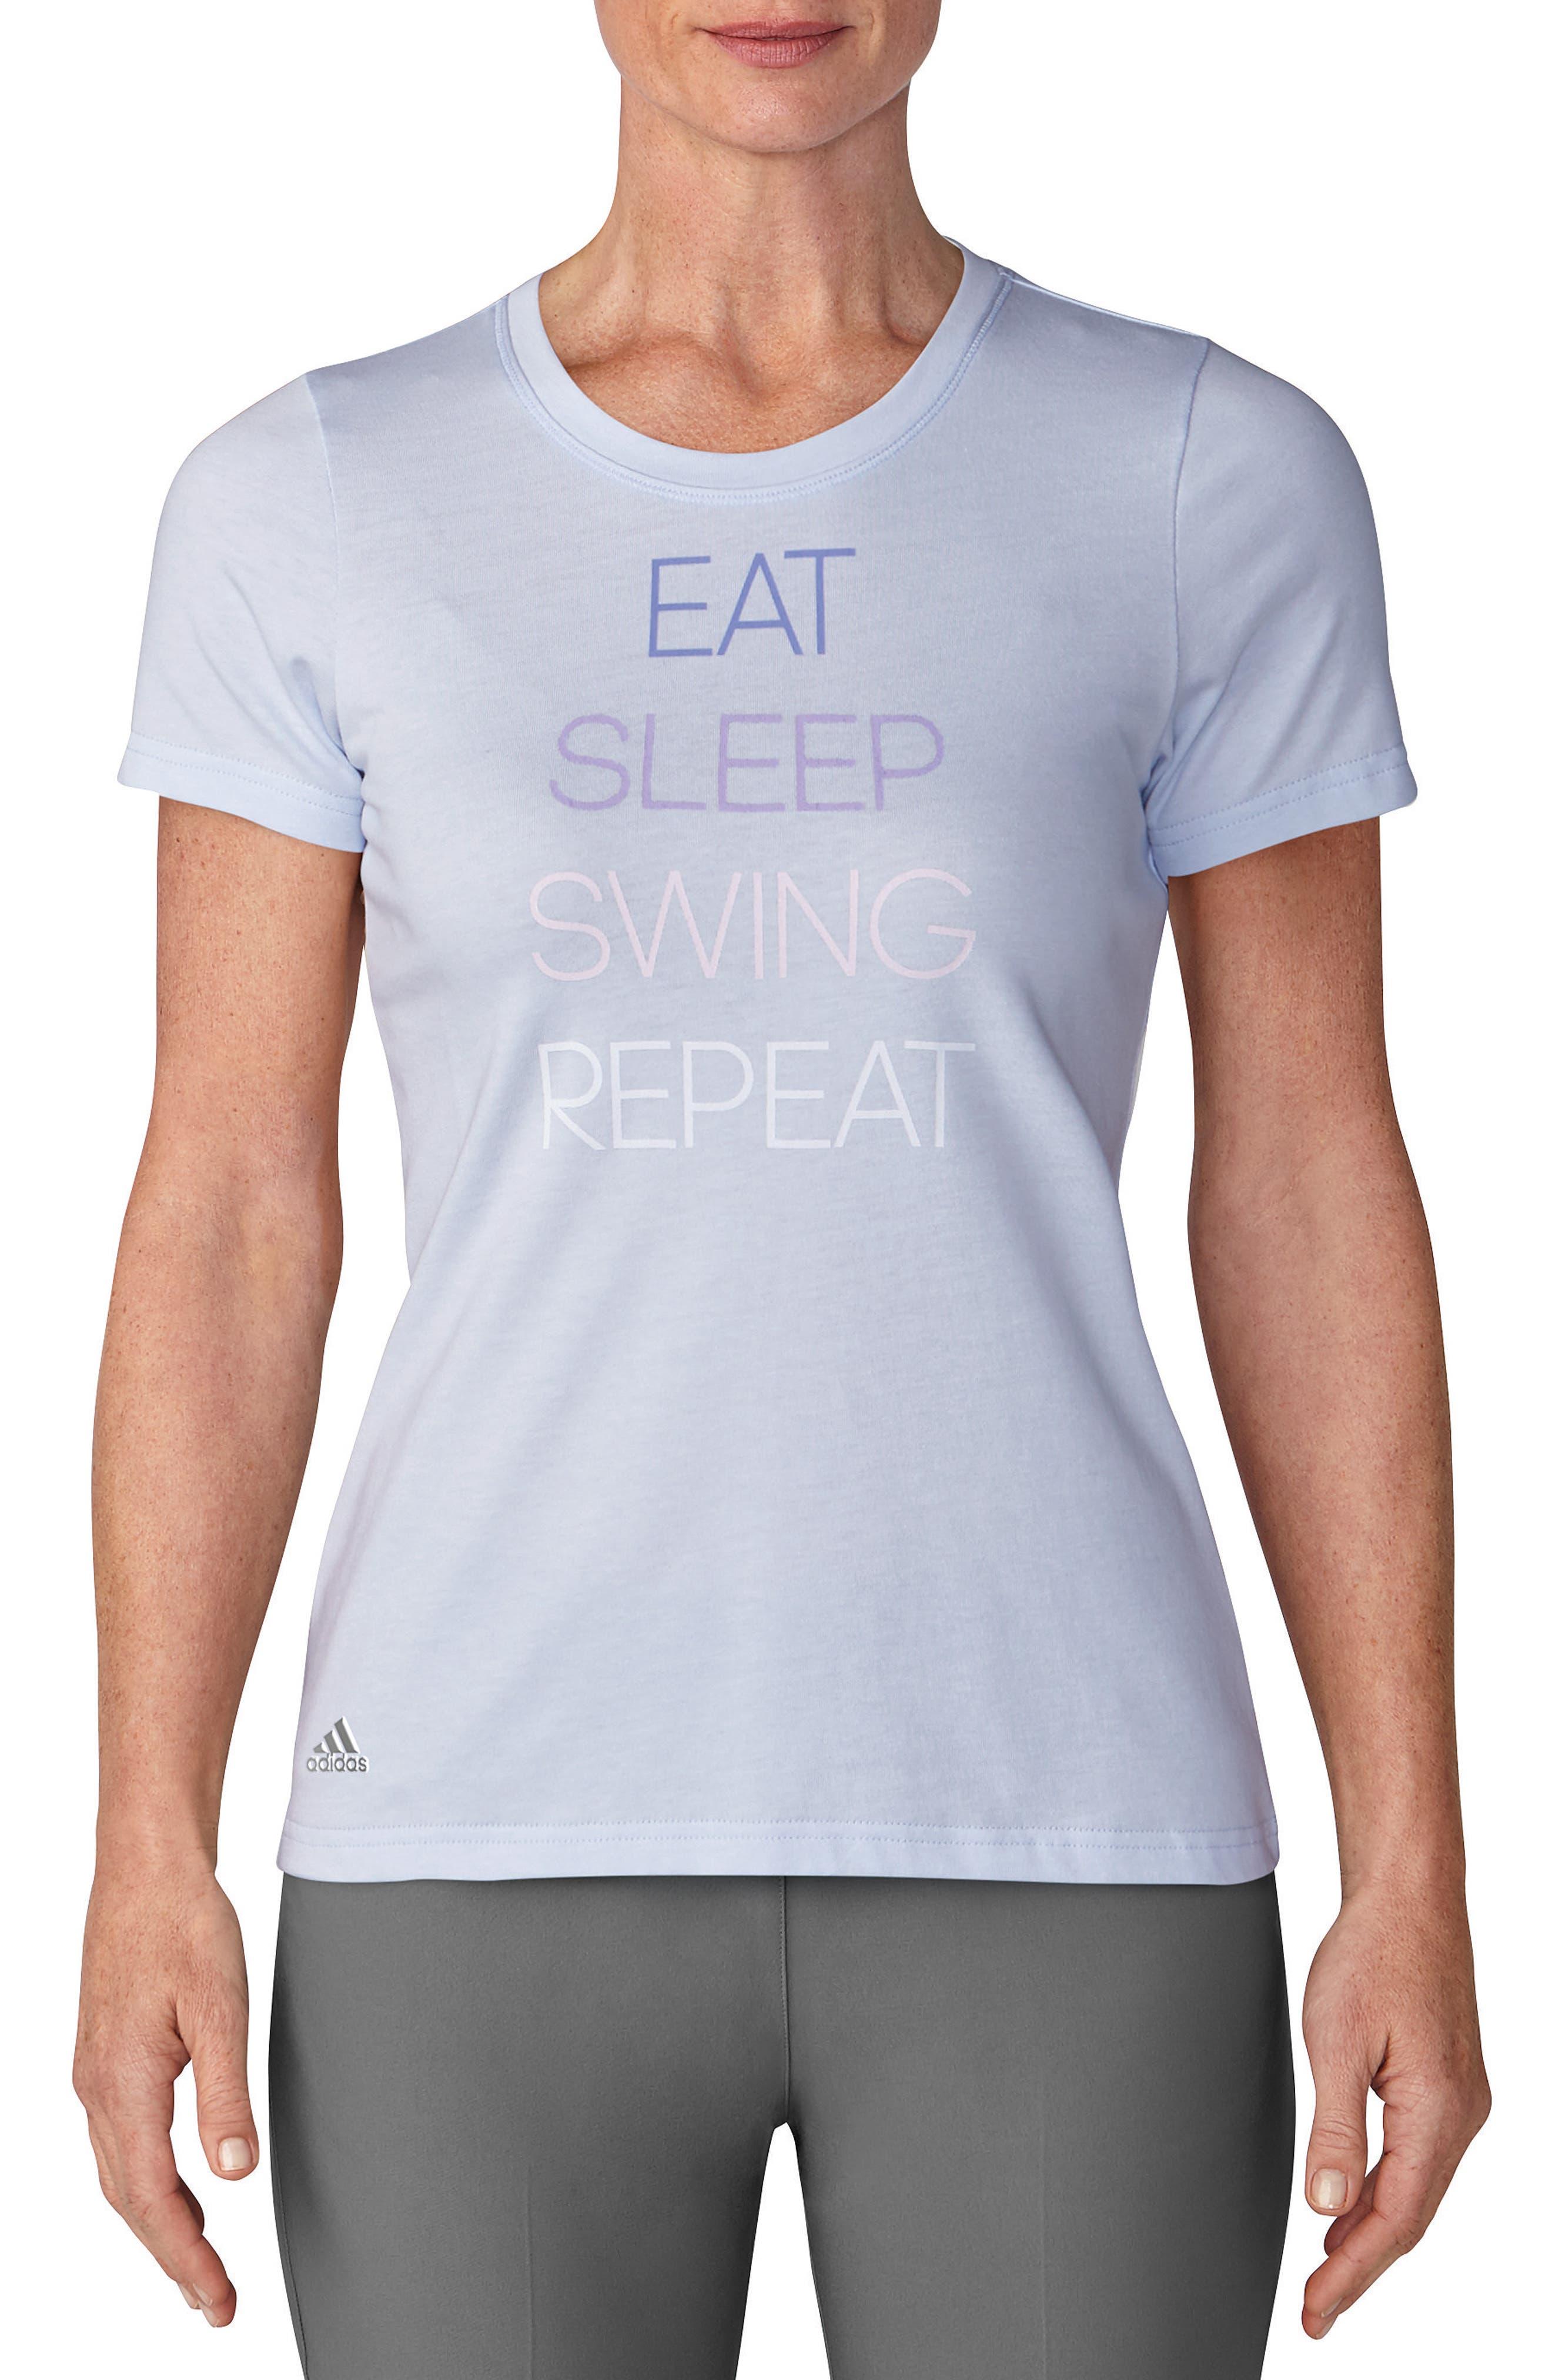 Main Image - adidas Eat, Swing, Sleep, Repeat Graphic Tee